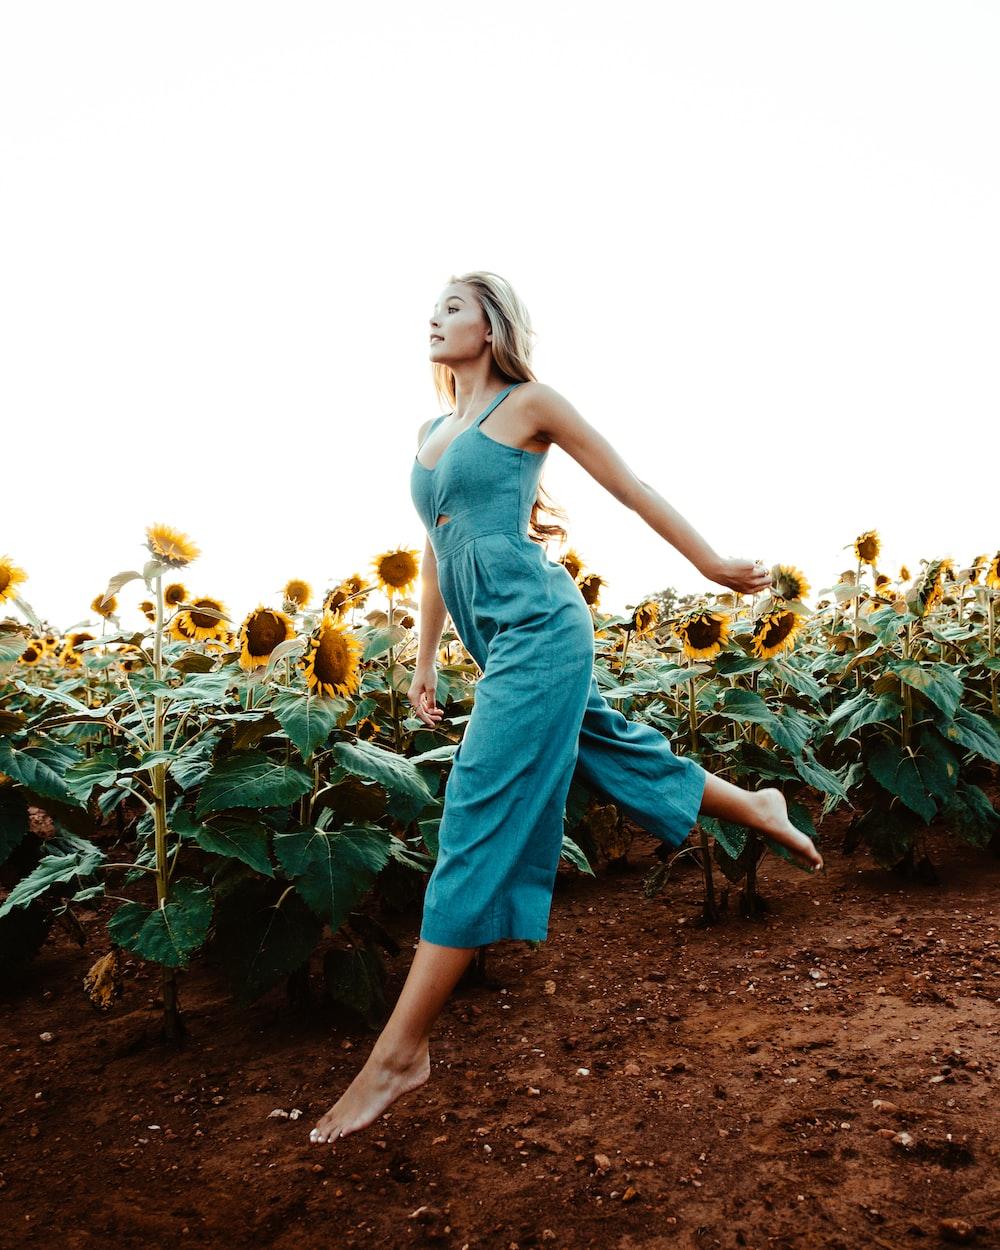 woman walking near the sunflower field at daytime